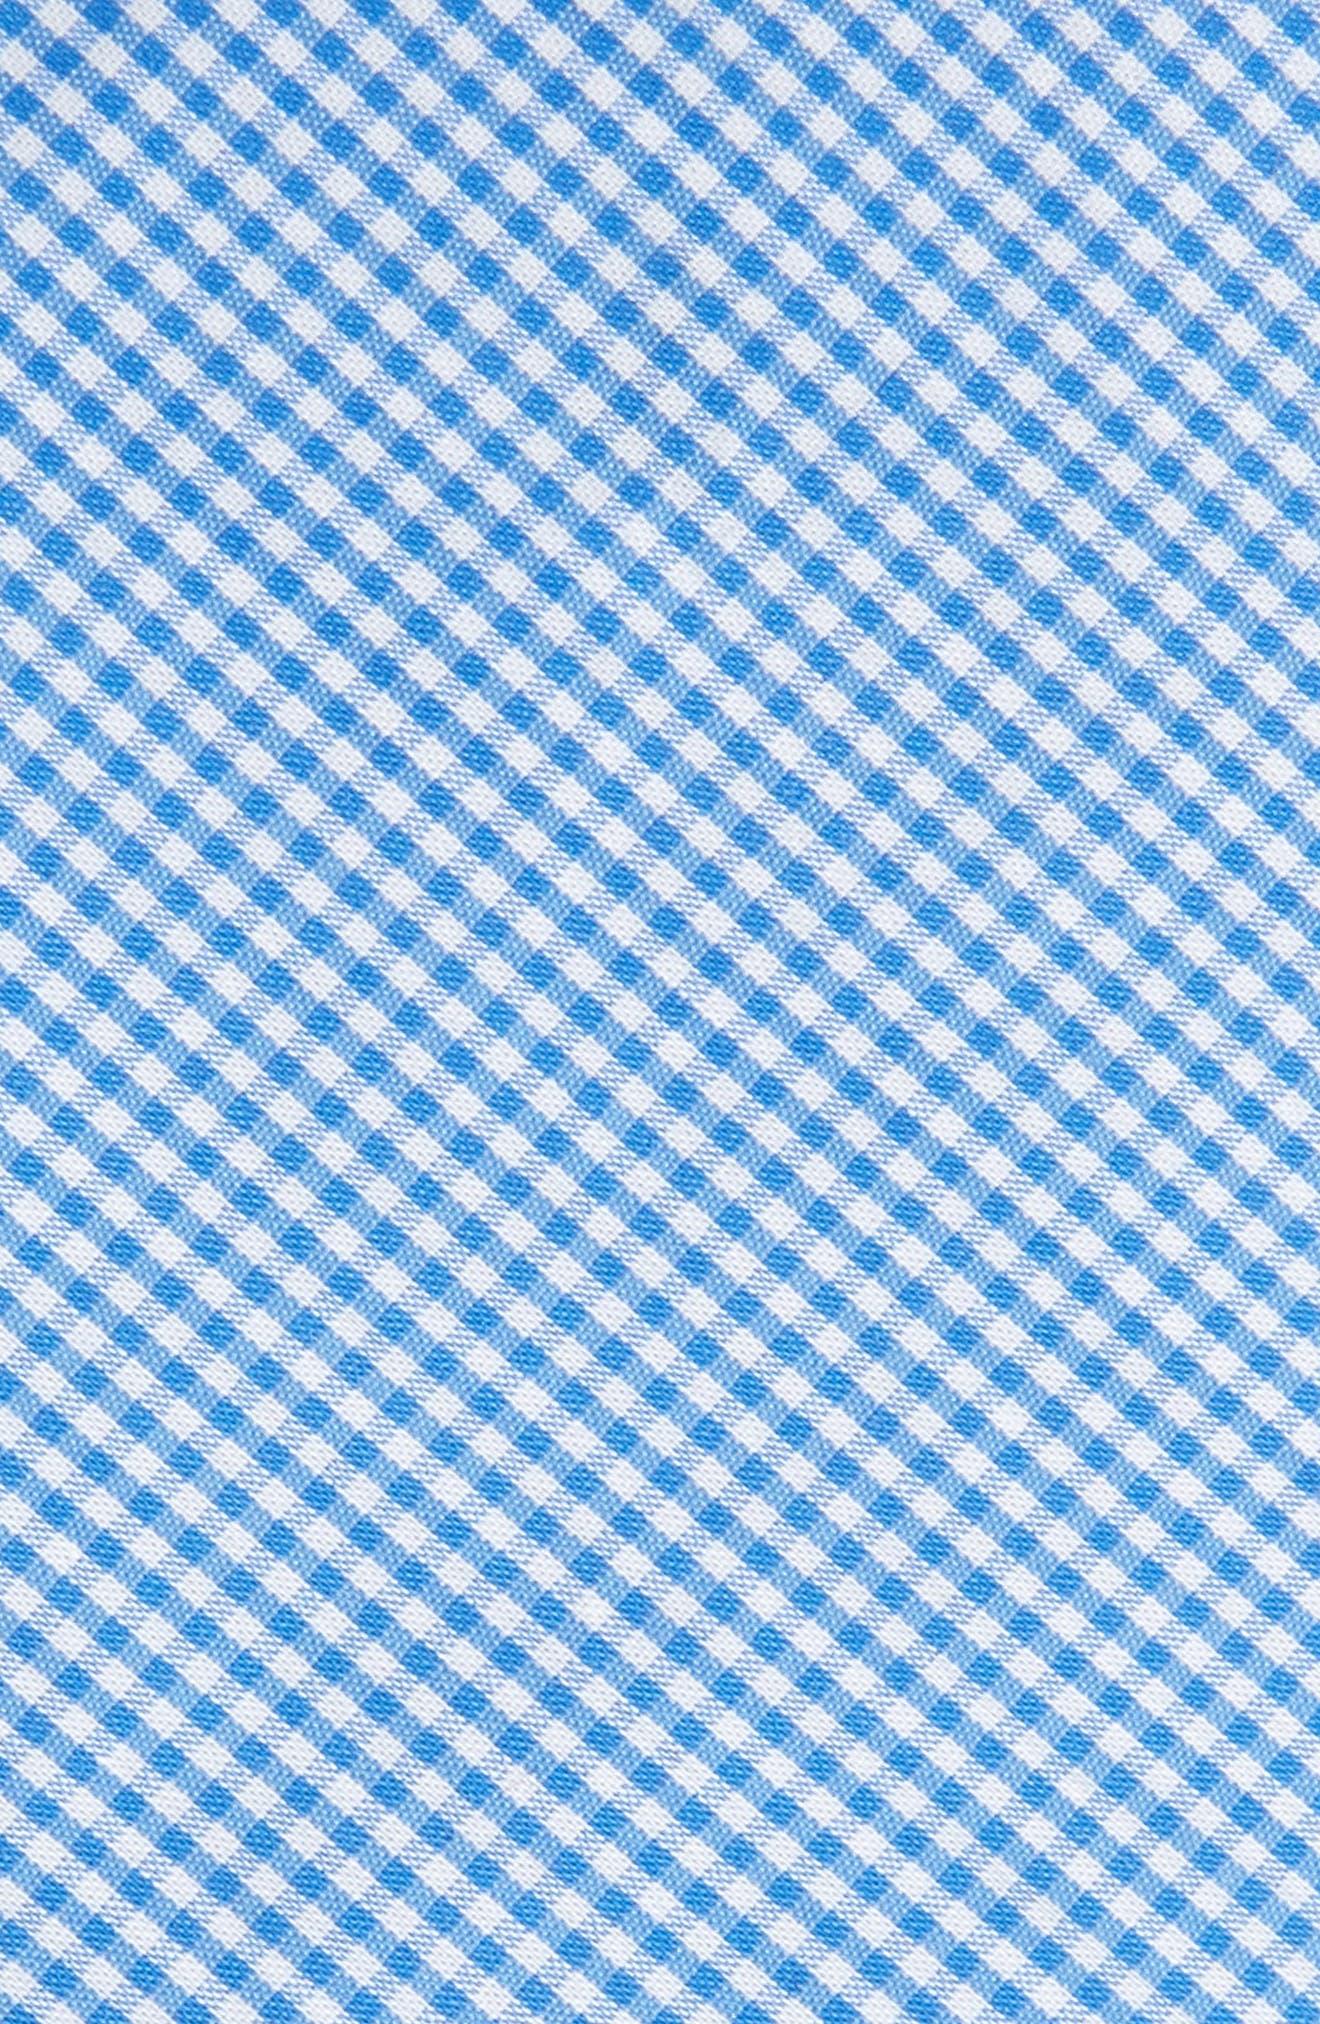 Sydney Check Cotton Skinny Tie,                             Alternate thumbnail 5, color,